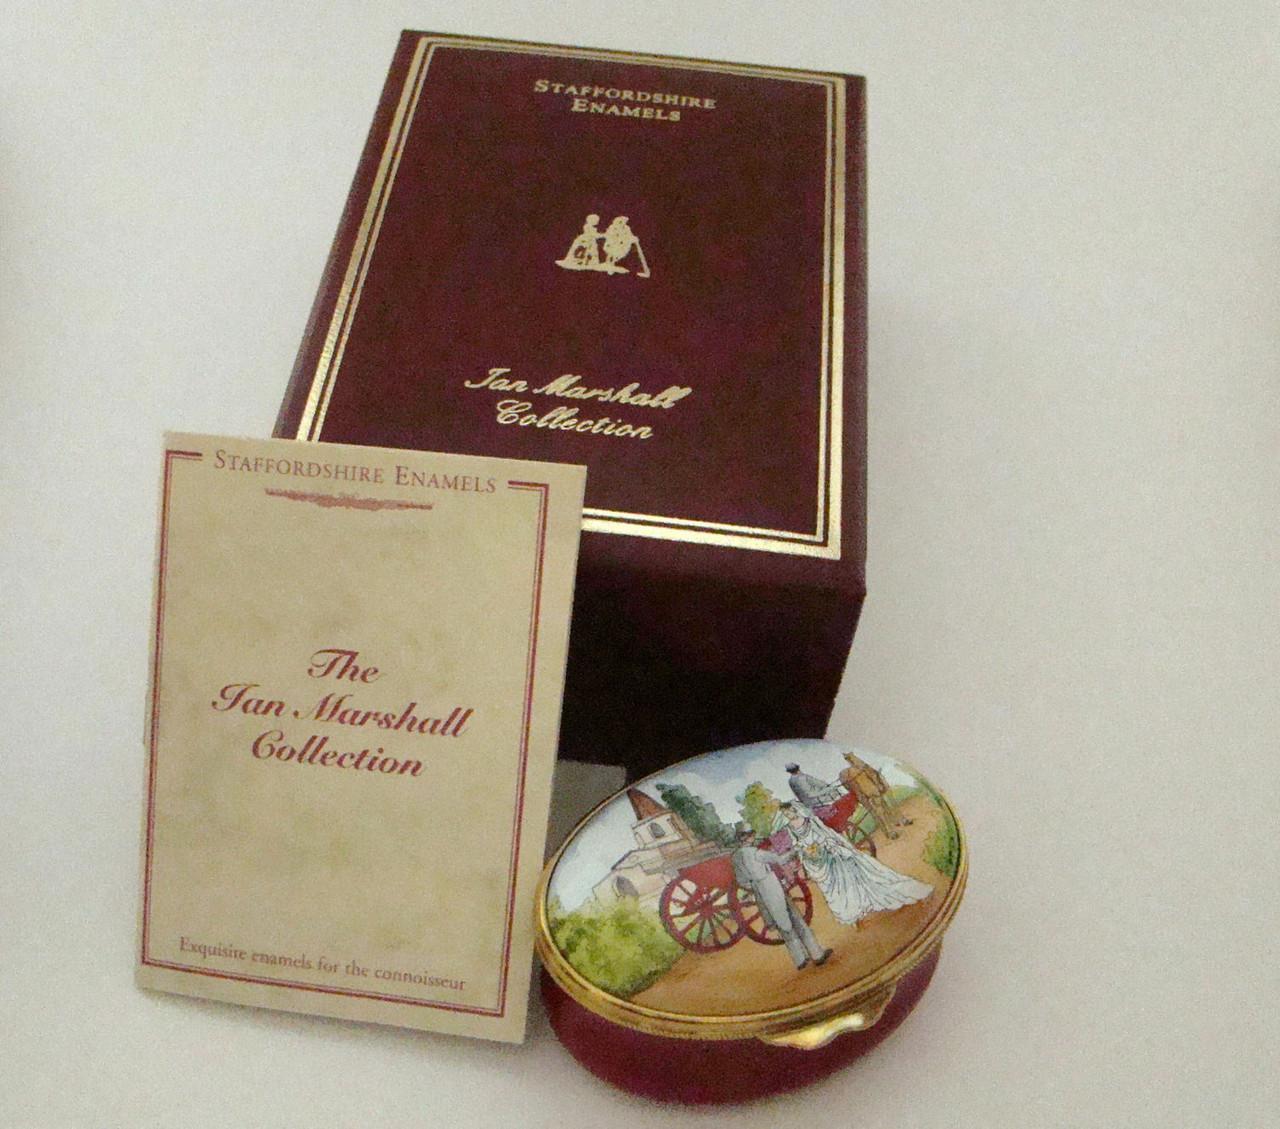 Staffordshire Wedding Box (21-192)